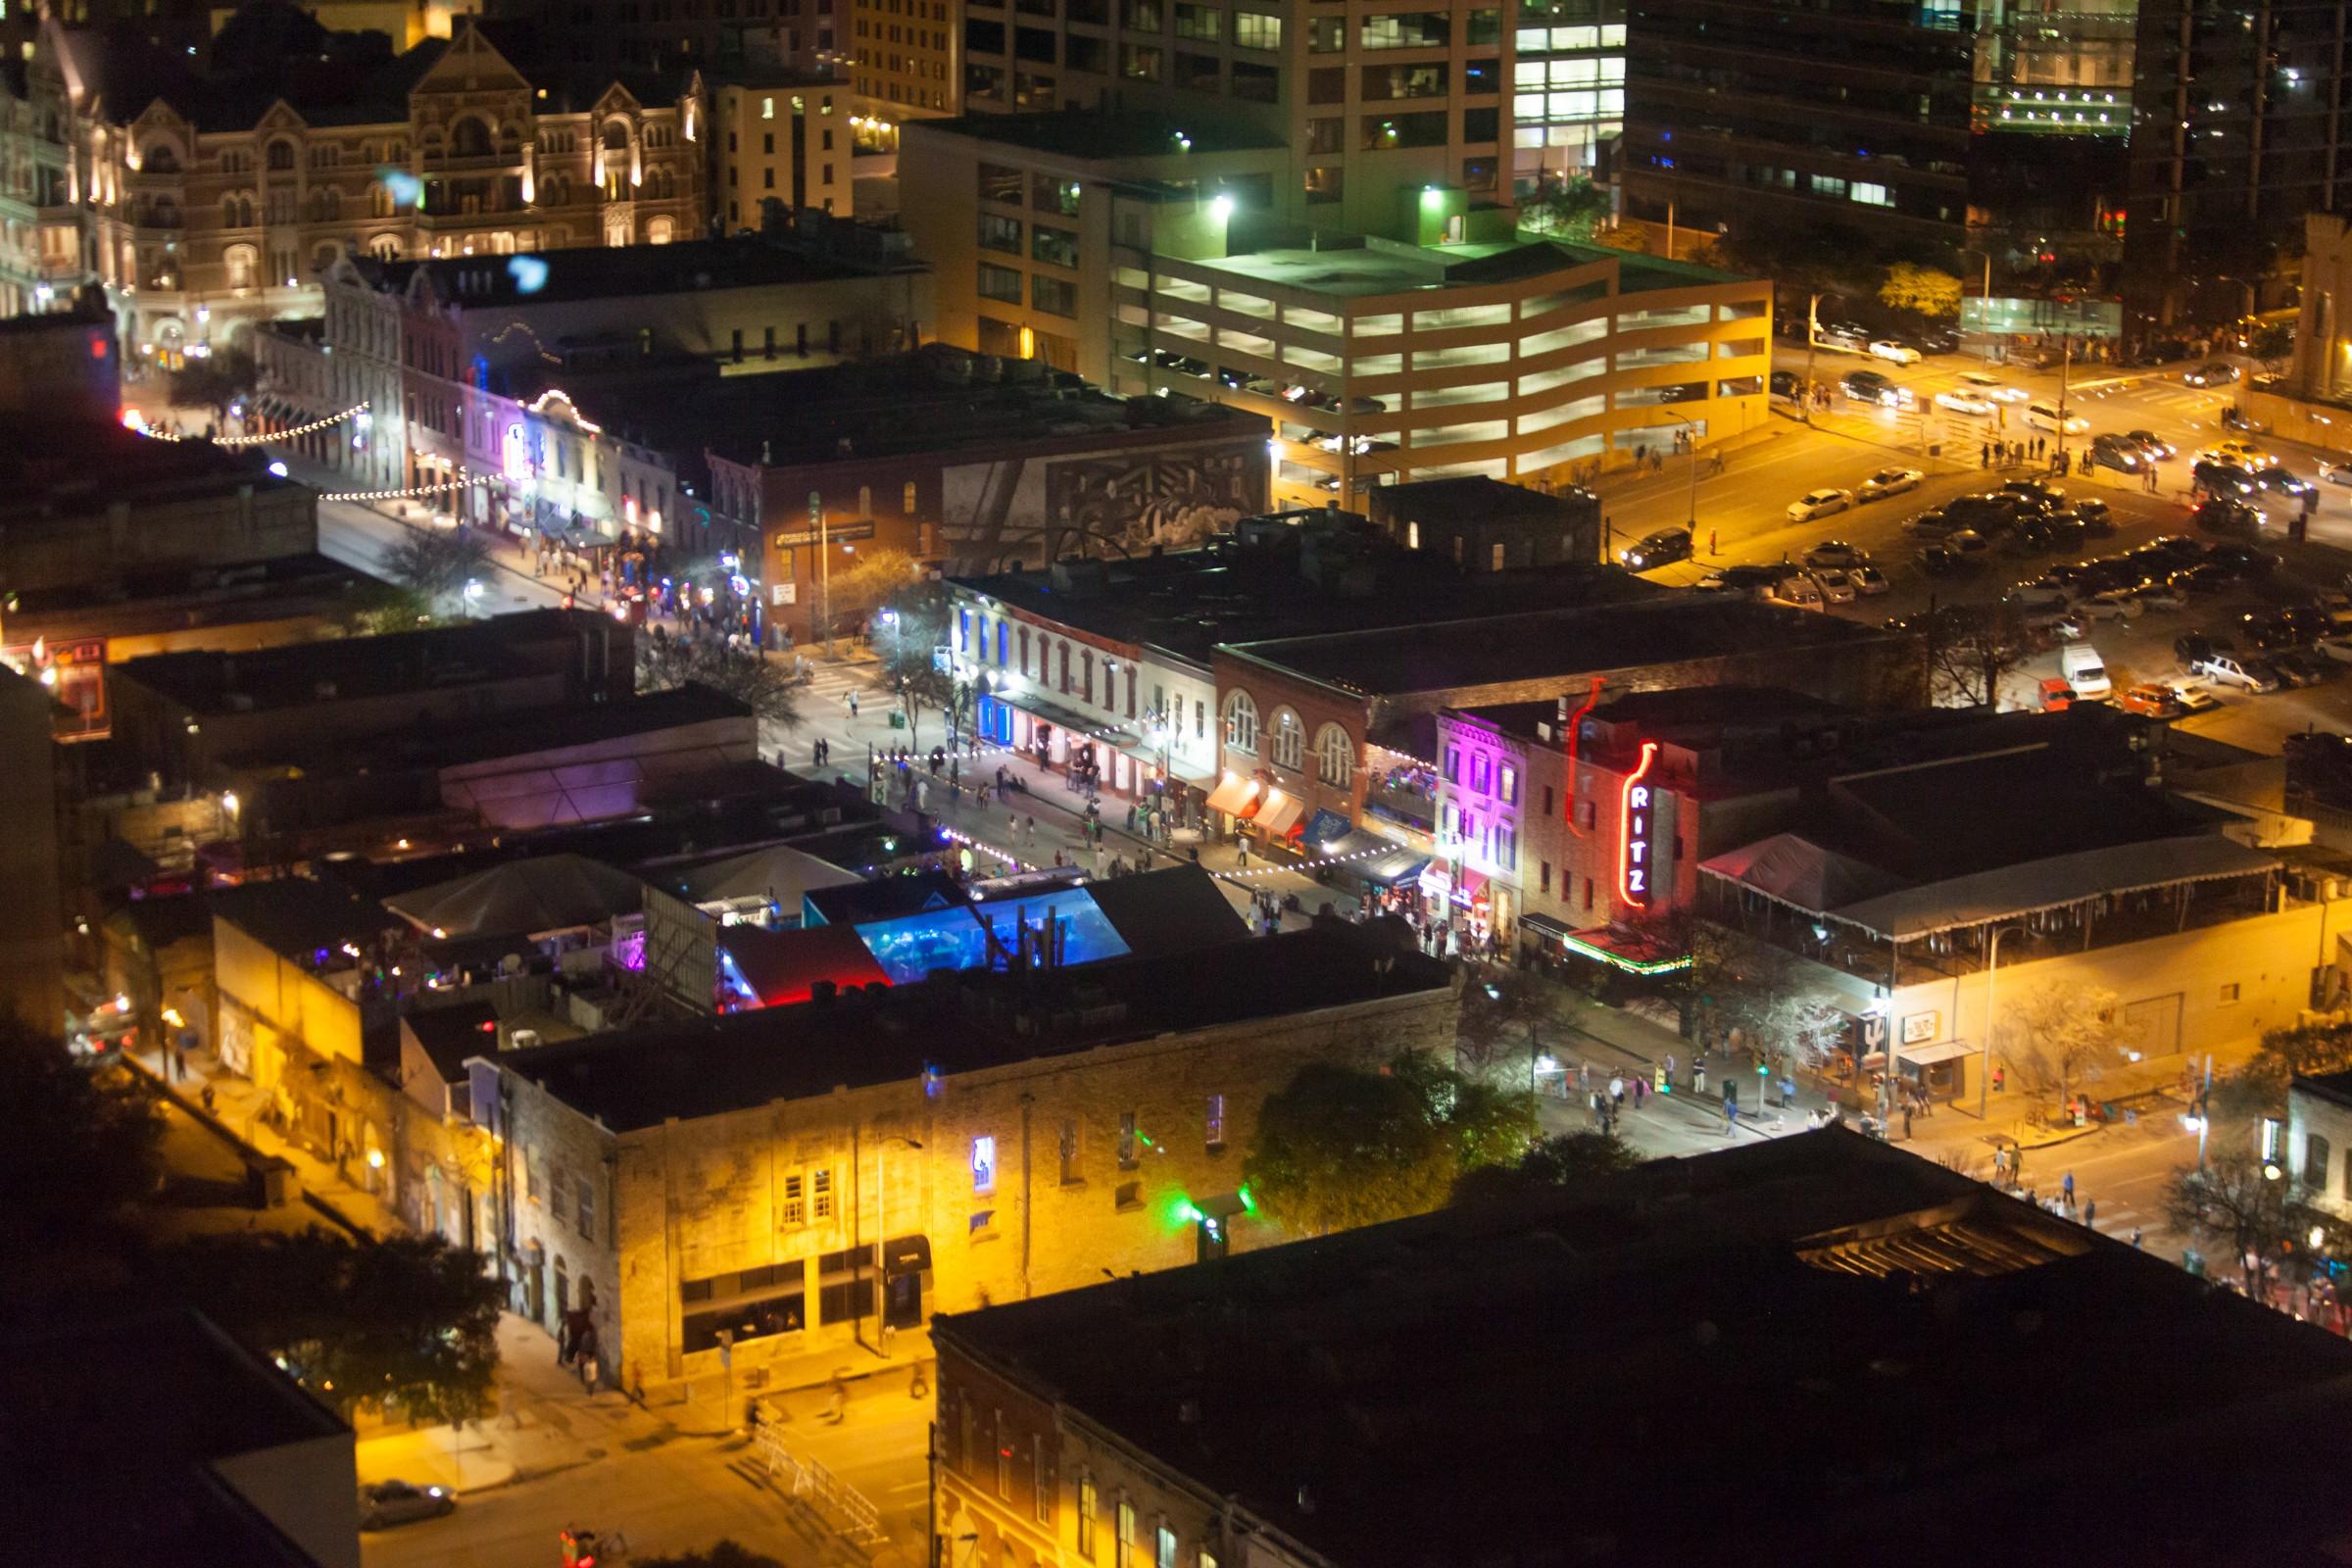 SXSW 2015 by Tendenci